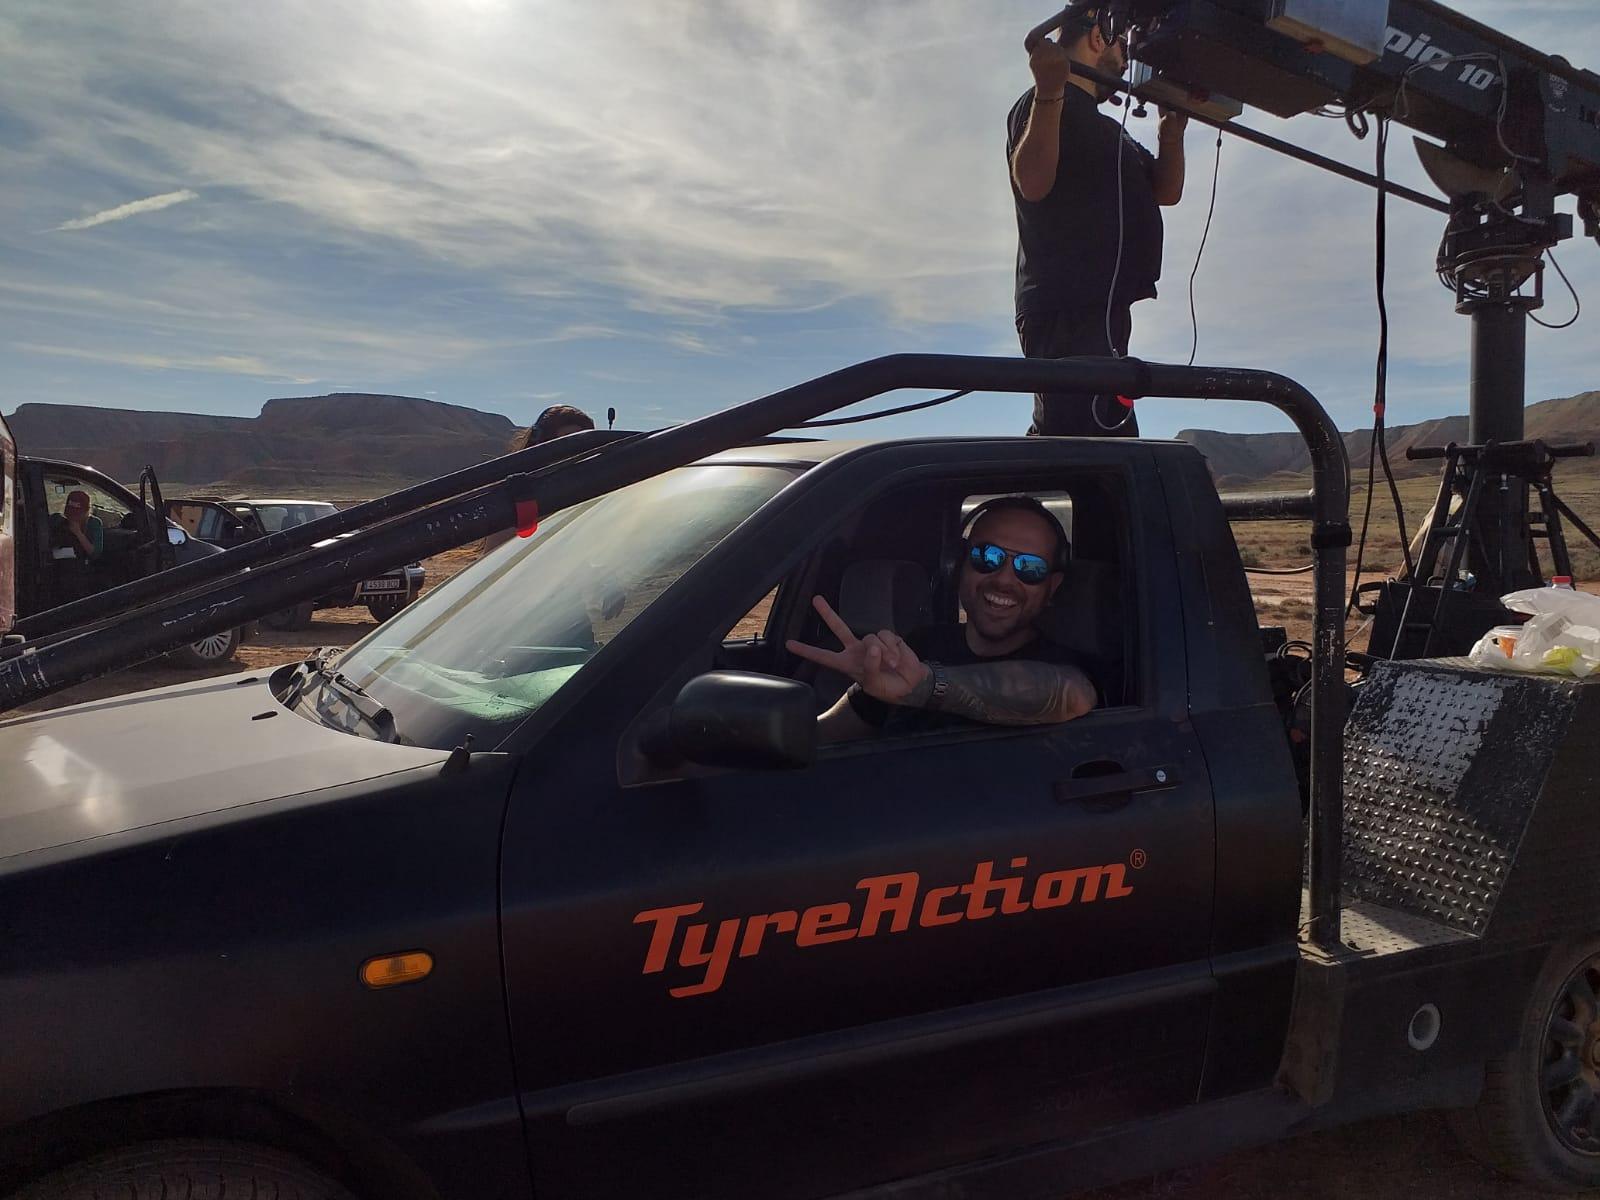 tyreaction service vision Making of rodaje aitana y lola indigo me quedo alquiler camaracar  scorpio arm pursuit rent a classic bus españa  jordi nebot car coordinator